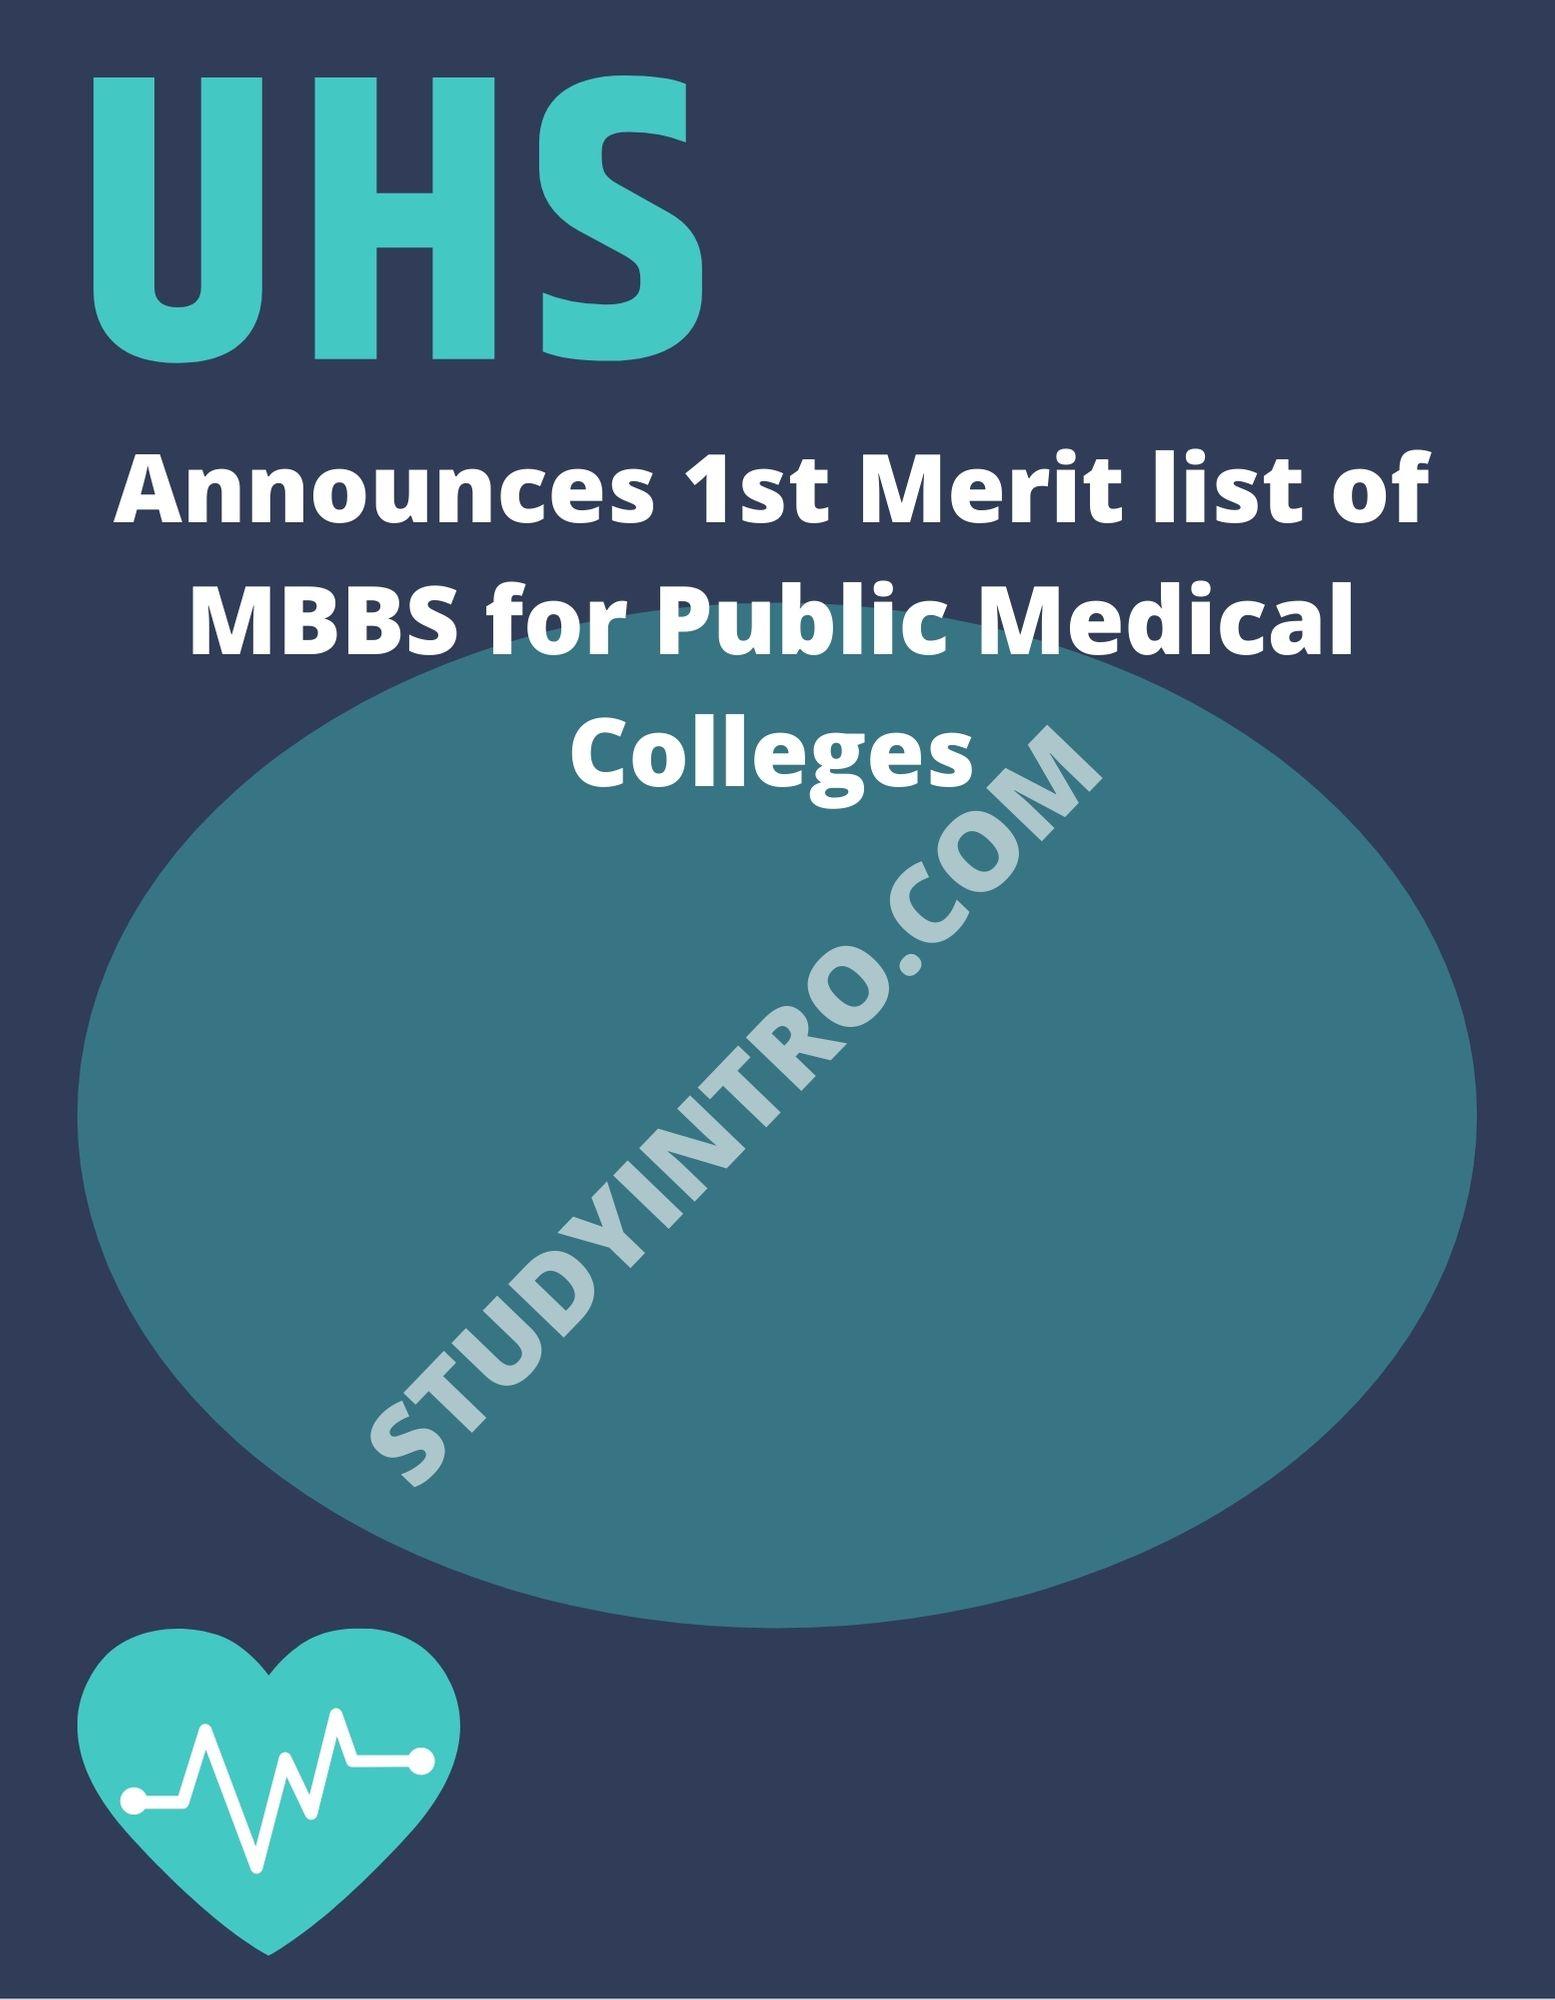 1st Merit List of MBBS